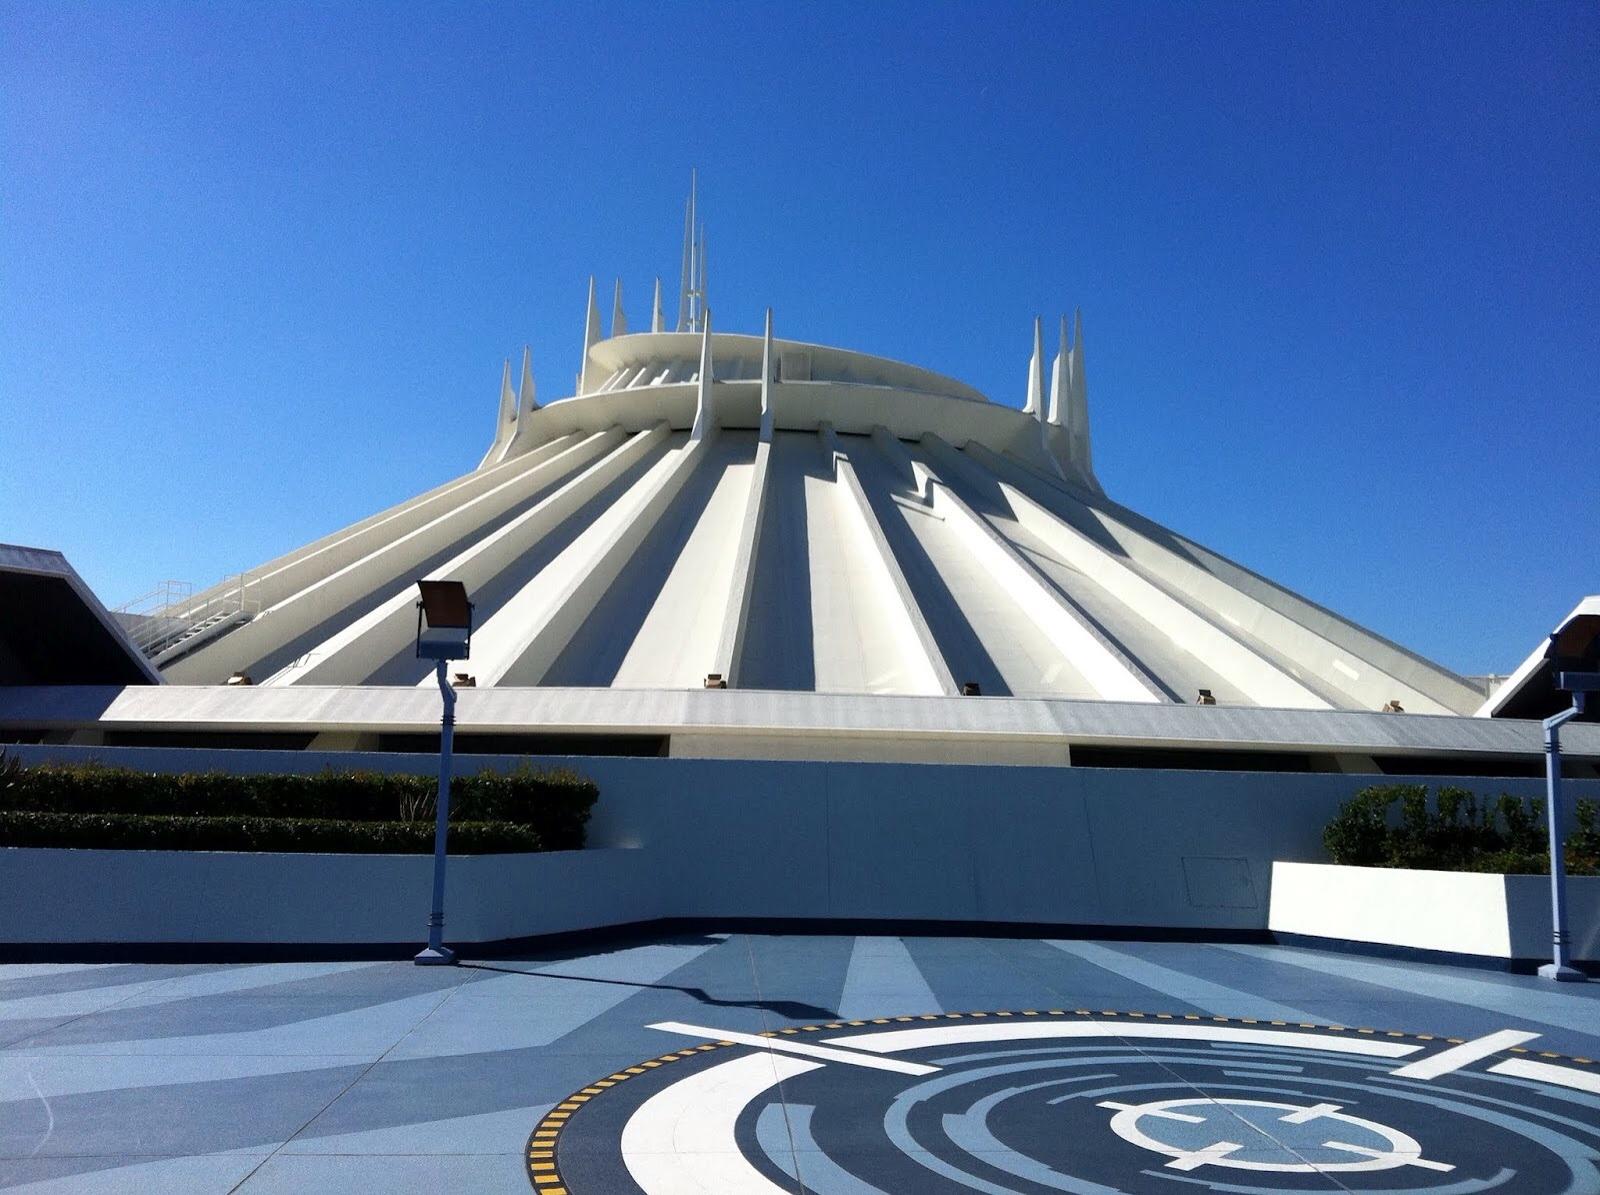 Disneyland Alert: Space Mountain Closed by Cal/OSHA ...